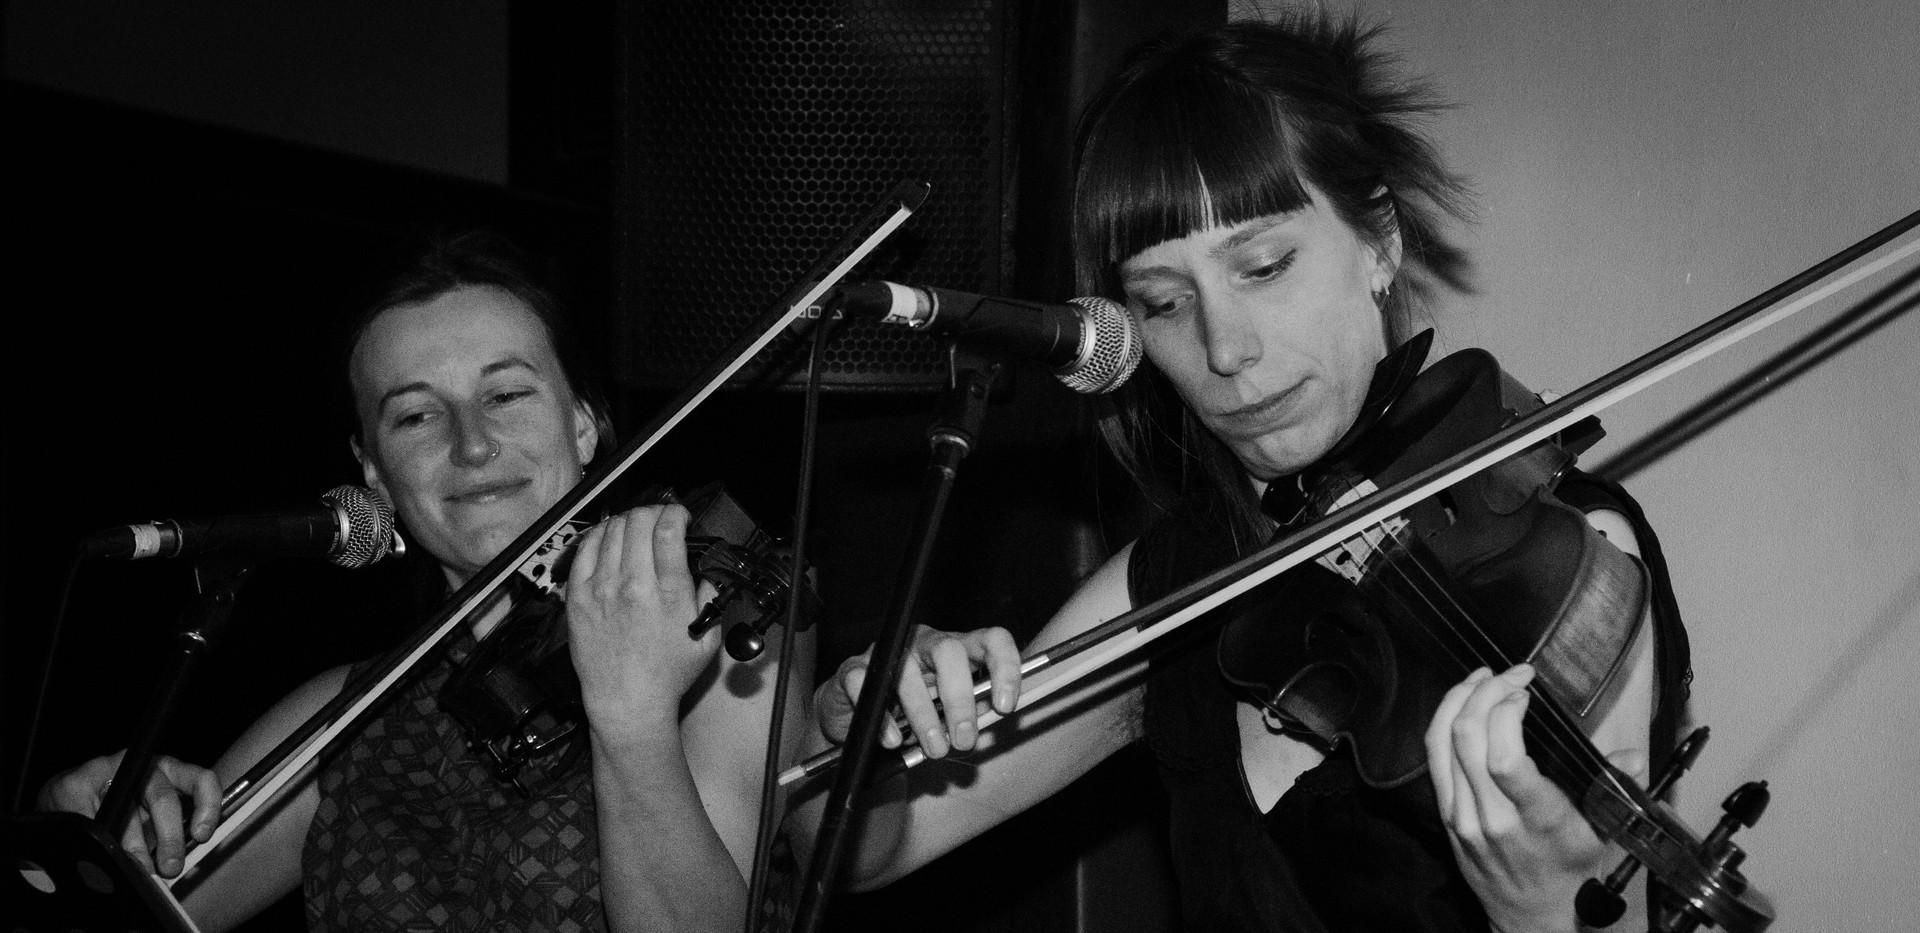 Alex & Sophie play fiddles